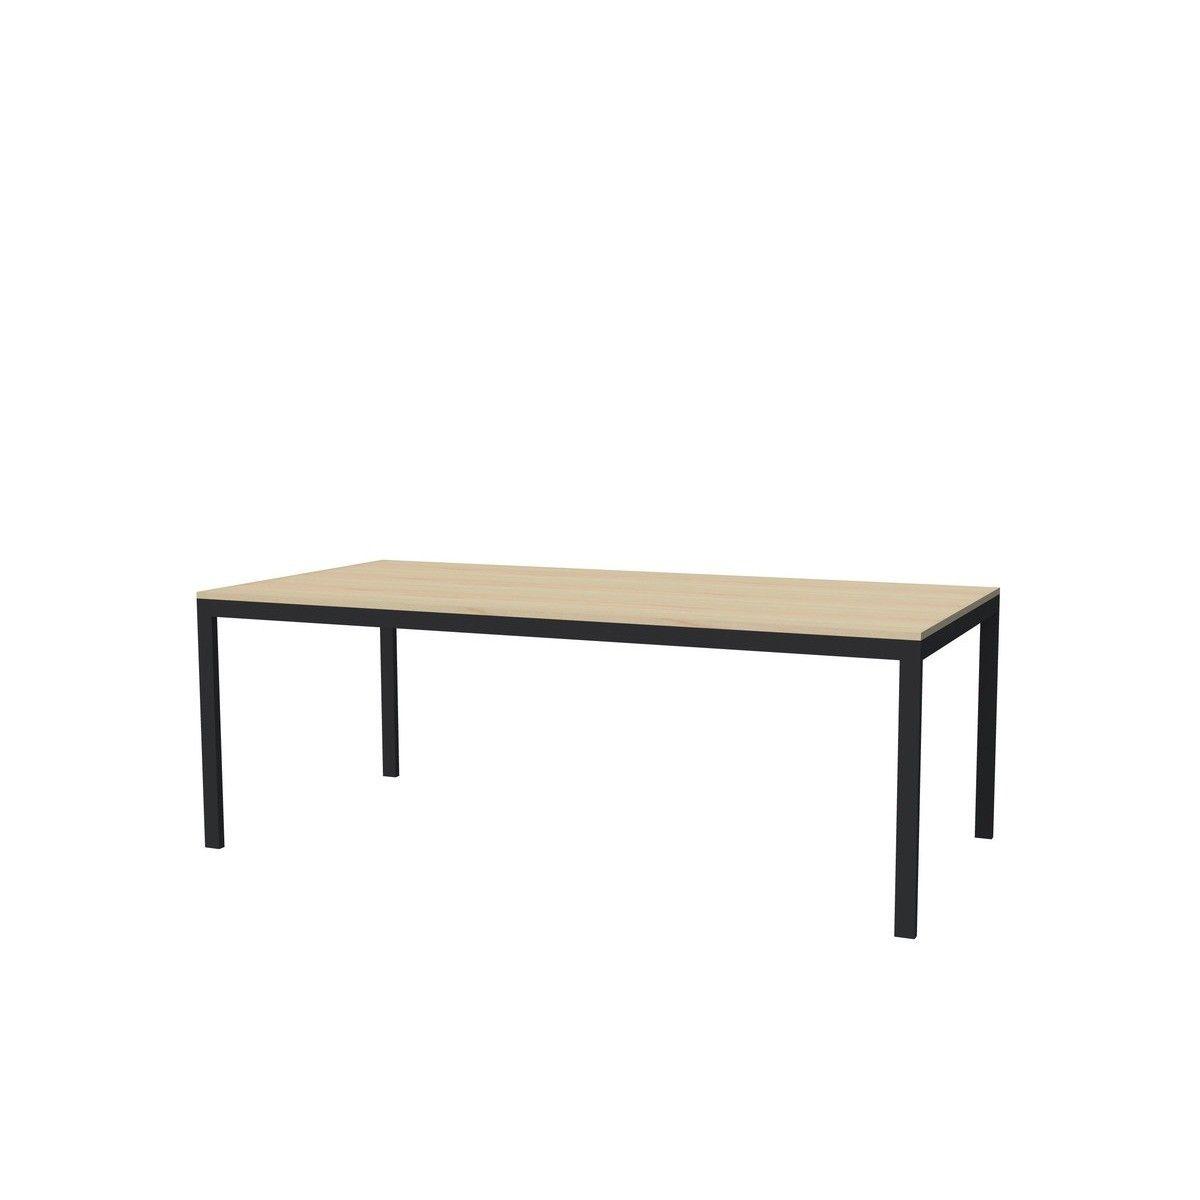 669 Fait Montreal Aussi Dispo Avec Pattes Blanches Ou Metalliques Tables A Diner Allais Erable Placage 40 X 84 8 Perso Table A Diner Table Mobilier